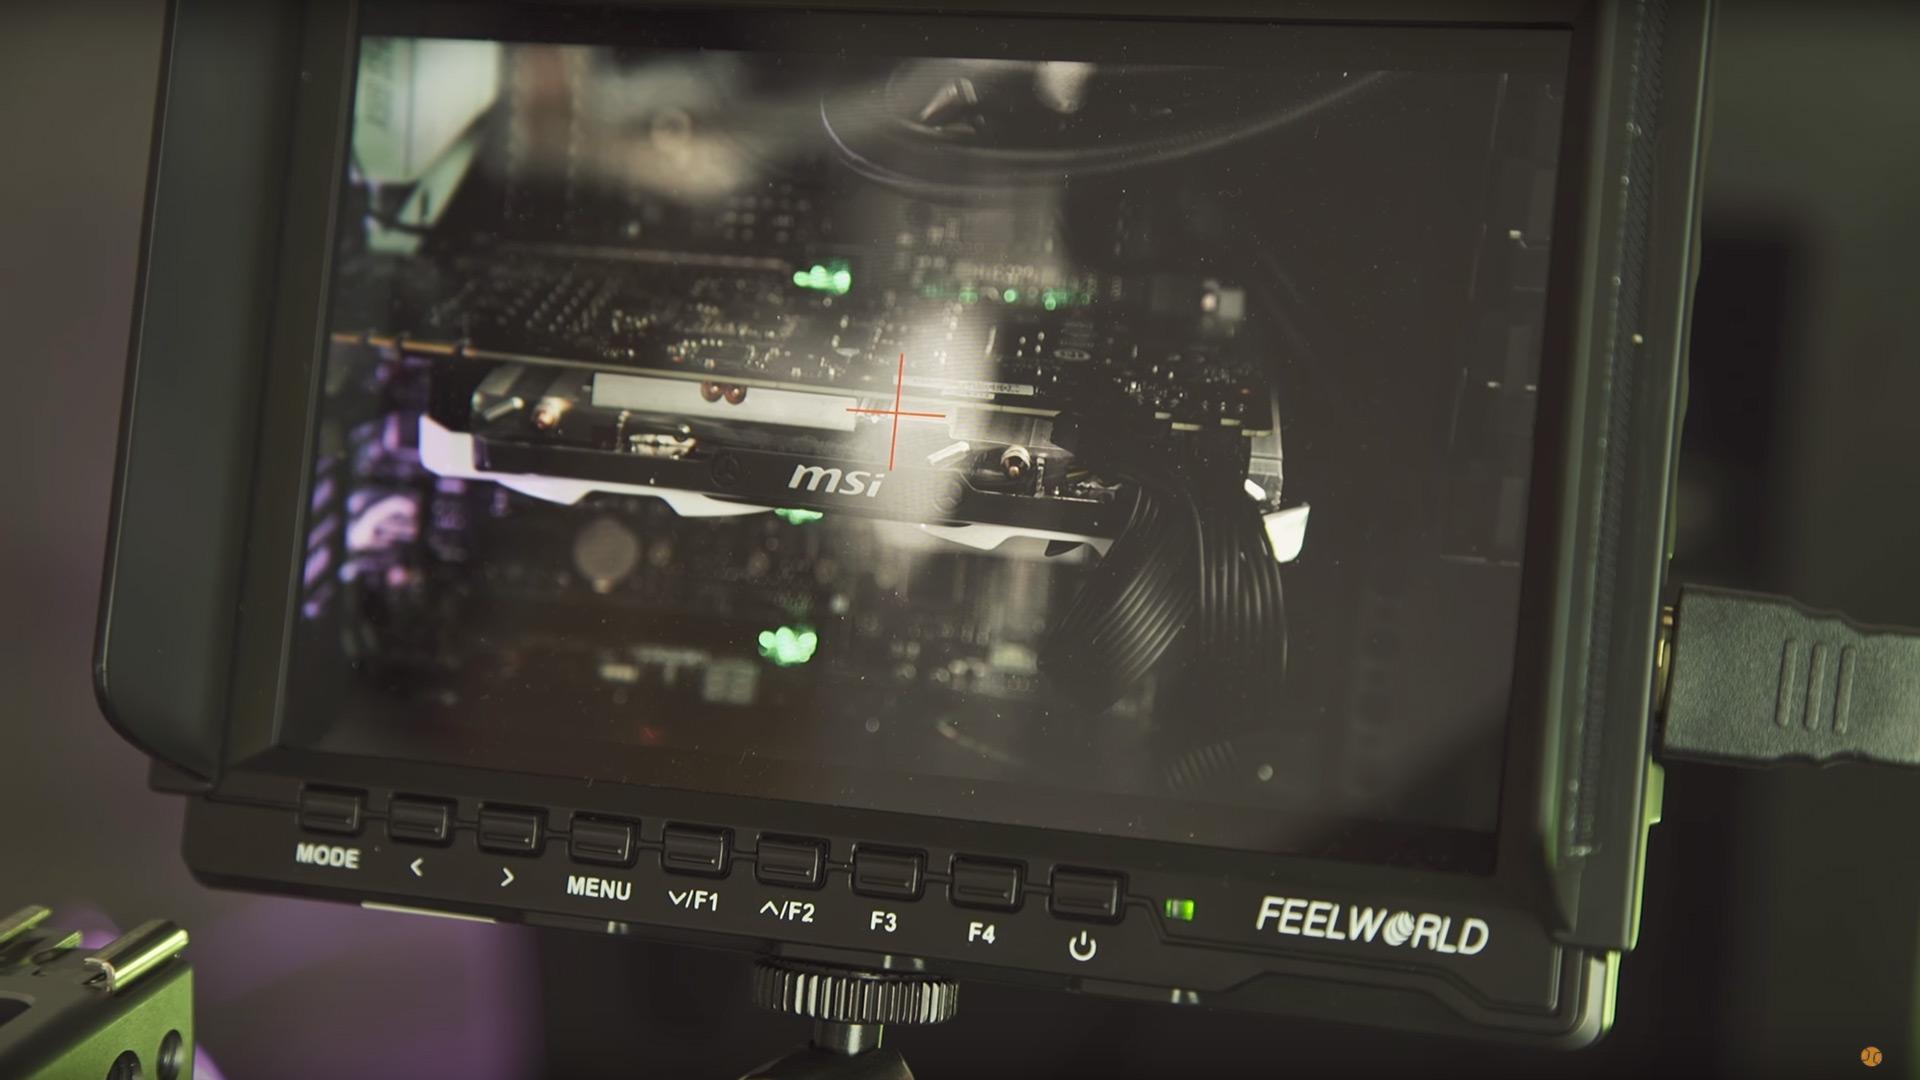 Feelworld-FW759-Screen.jpg